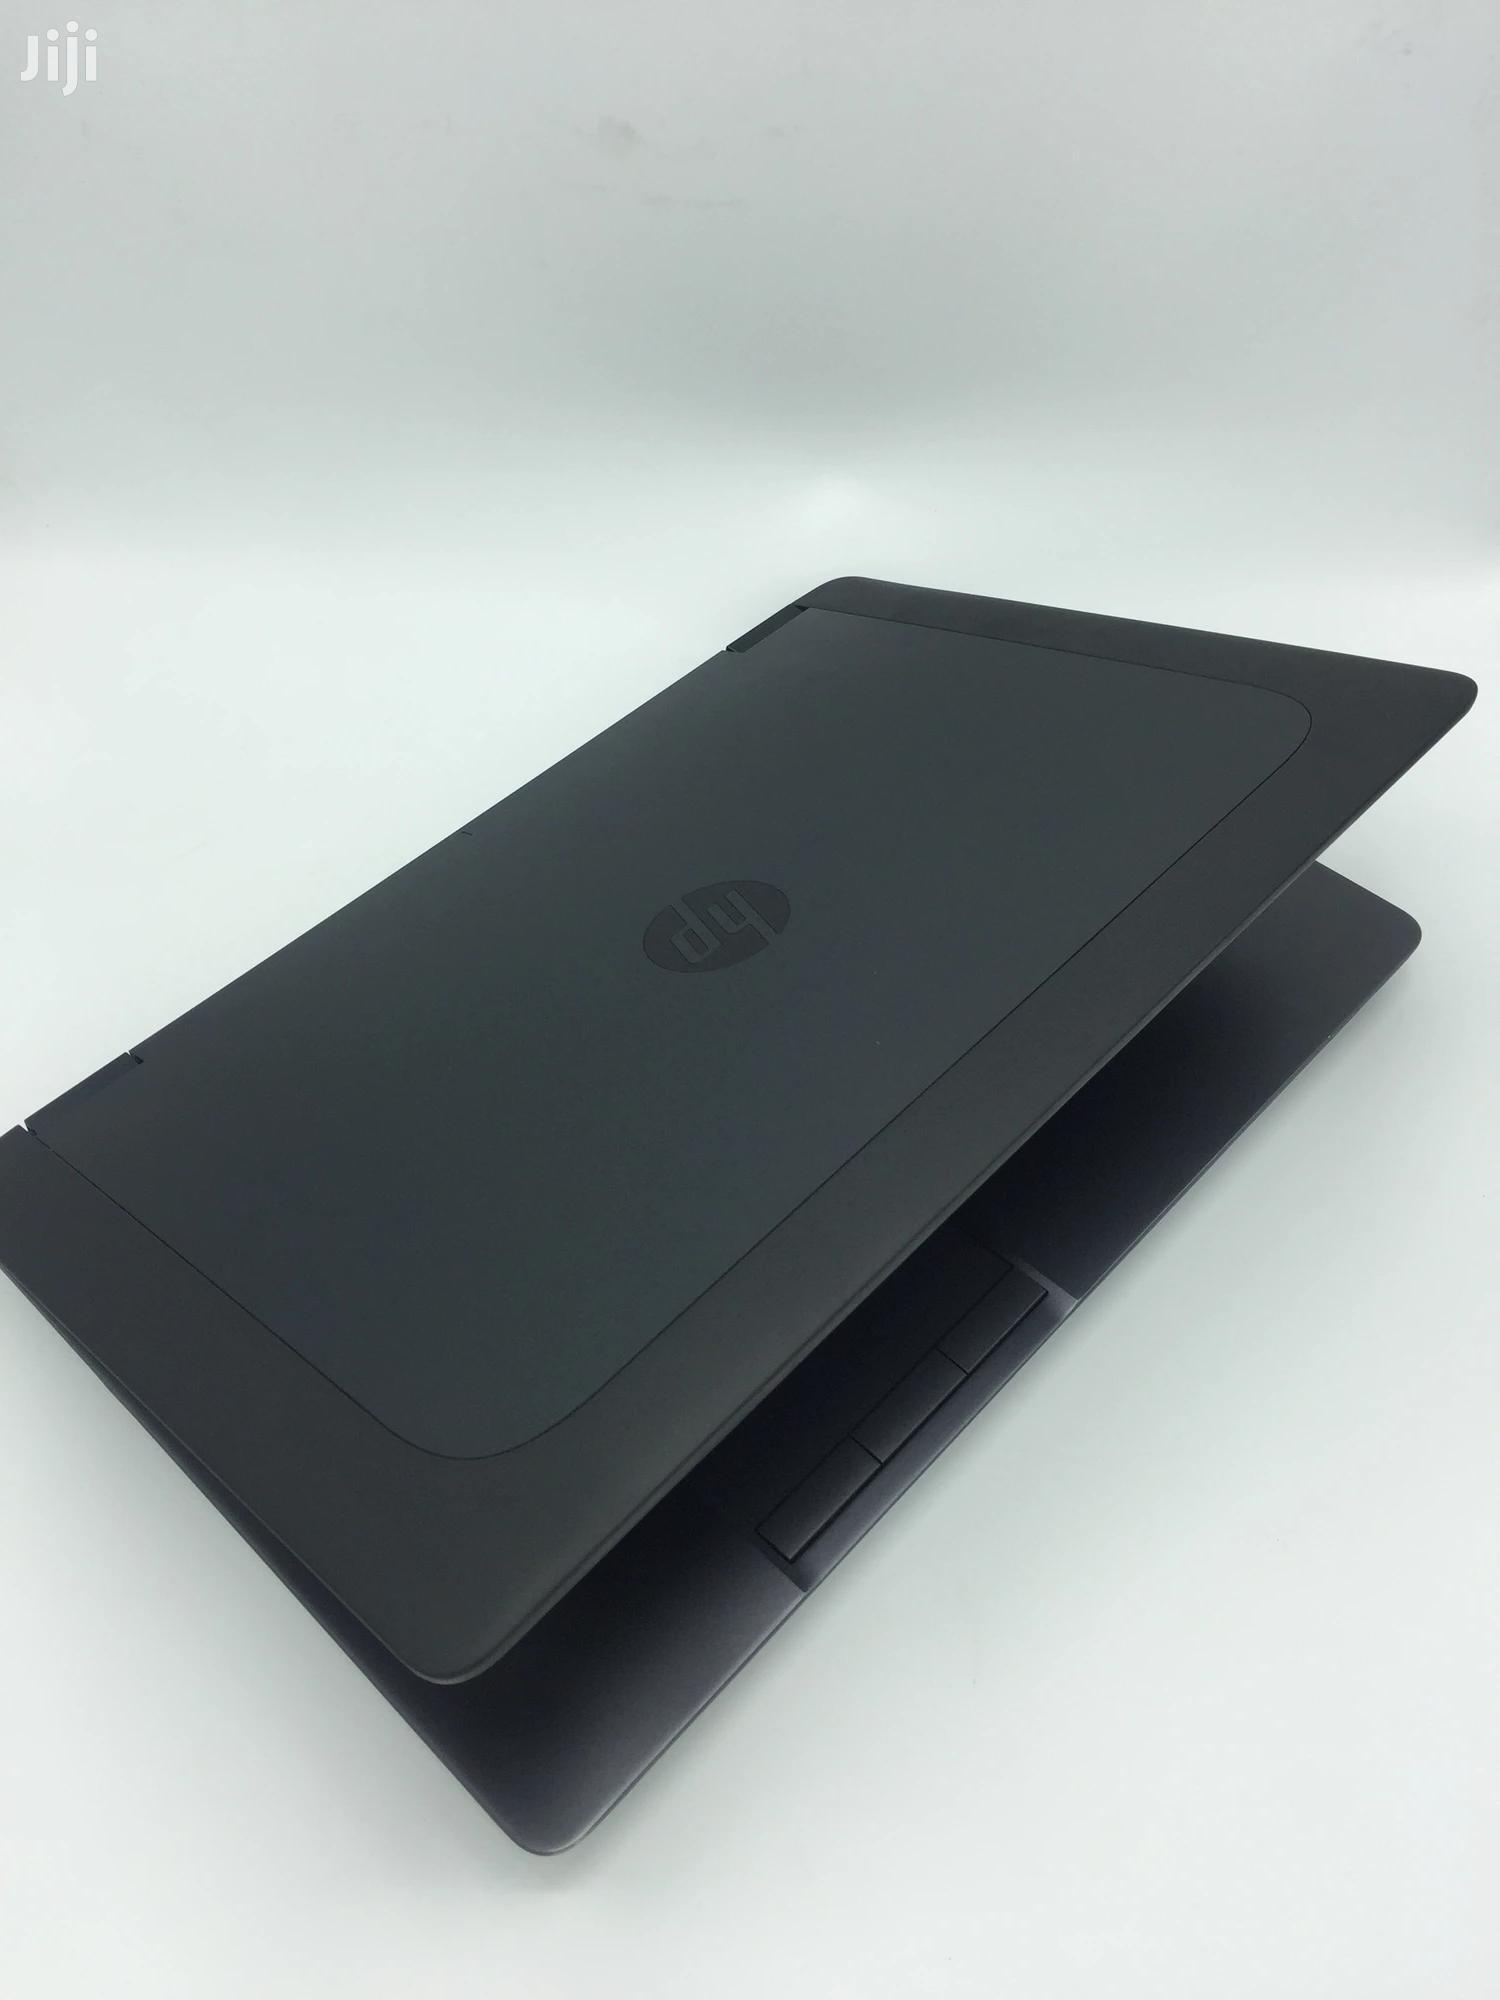 Laptop HP ZBook 15u G2 8GB Intel Core I5 HDD 1T | Laptops & Computers for sale in Kampala, Central Region, Uganda